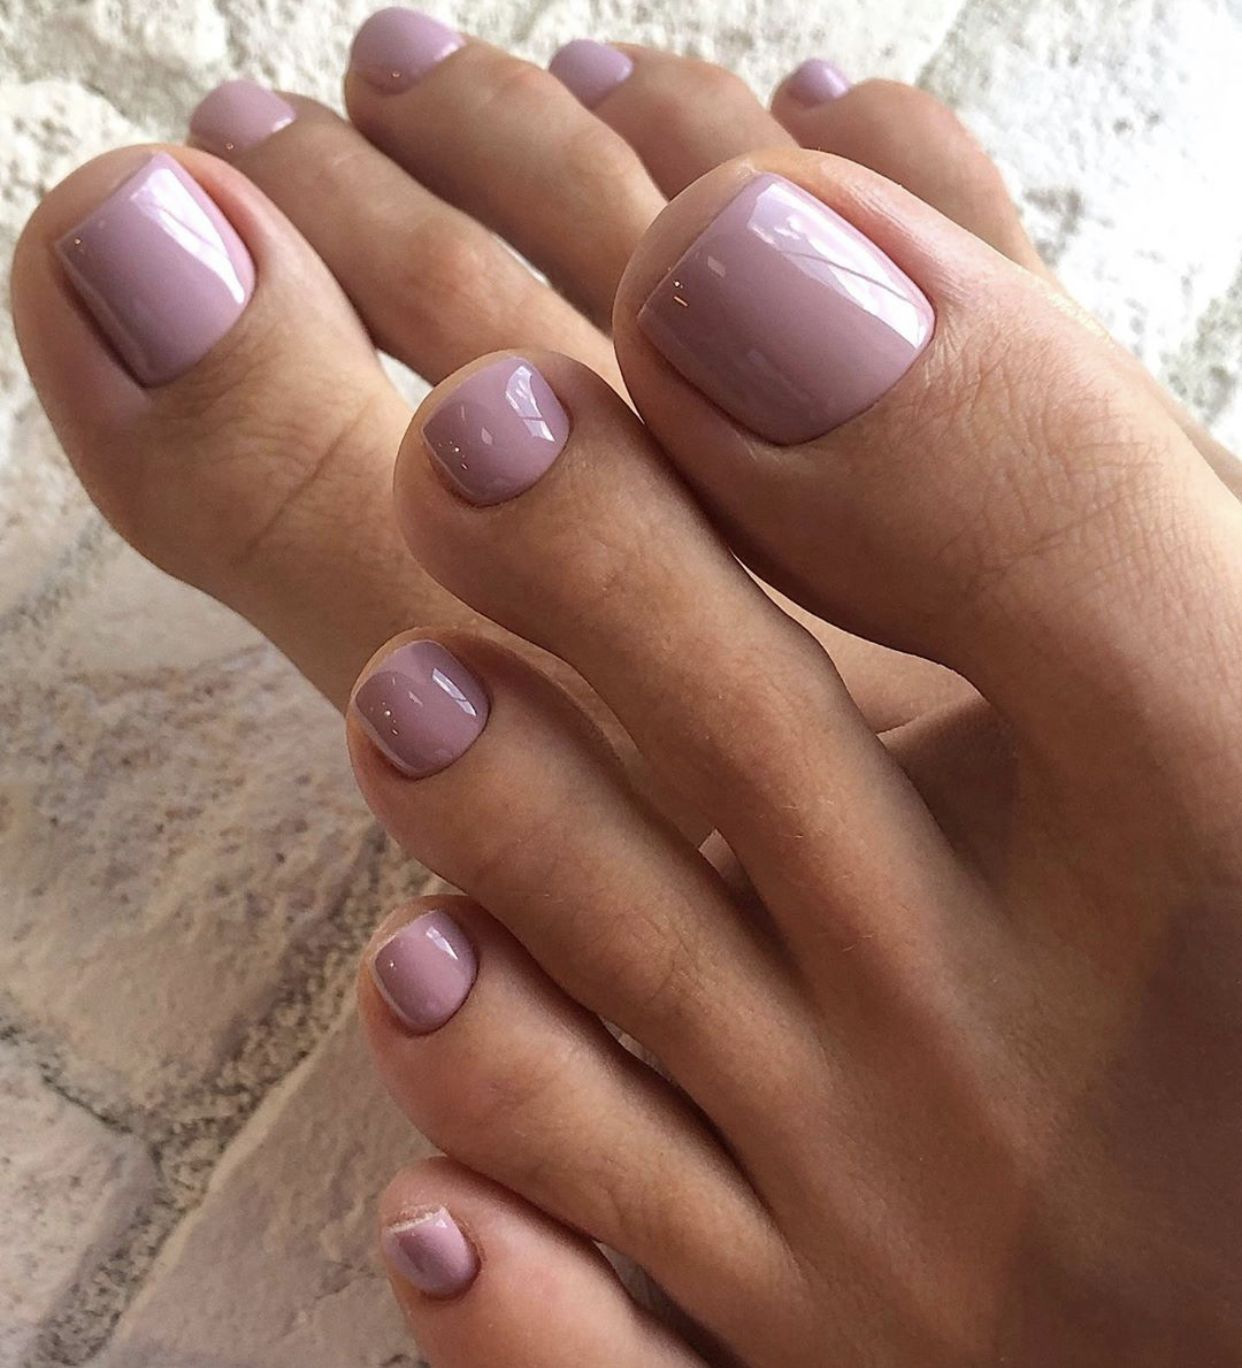 Pin By Petra Karesova On Pedicure Gel Toe Nails Pretty Toe Nails Cute Toe Nails